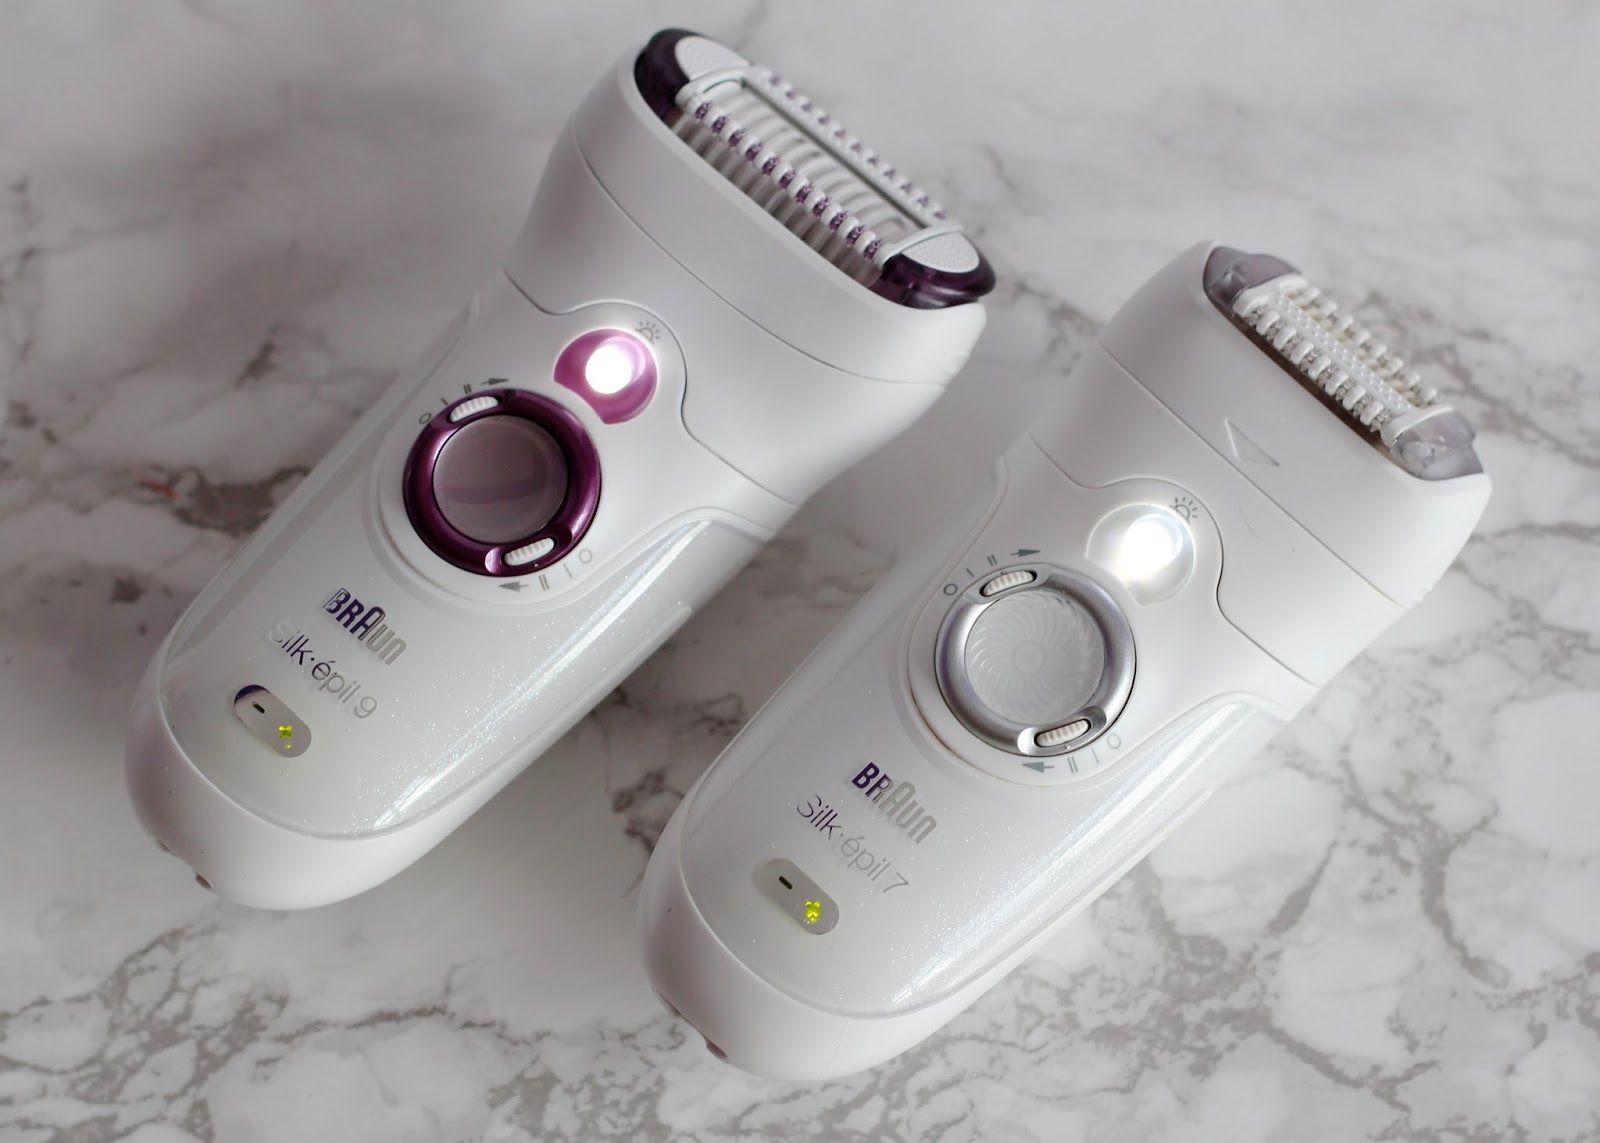 الفرق بين براون سيلك ابيل 7 و 9 والموديلات الاسبق Best Night Cream Best Hair Removal Products Moisturizer For Dry Skin